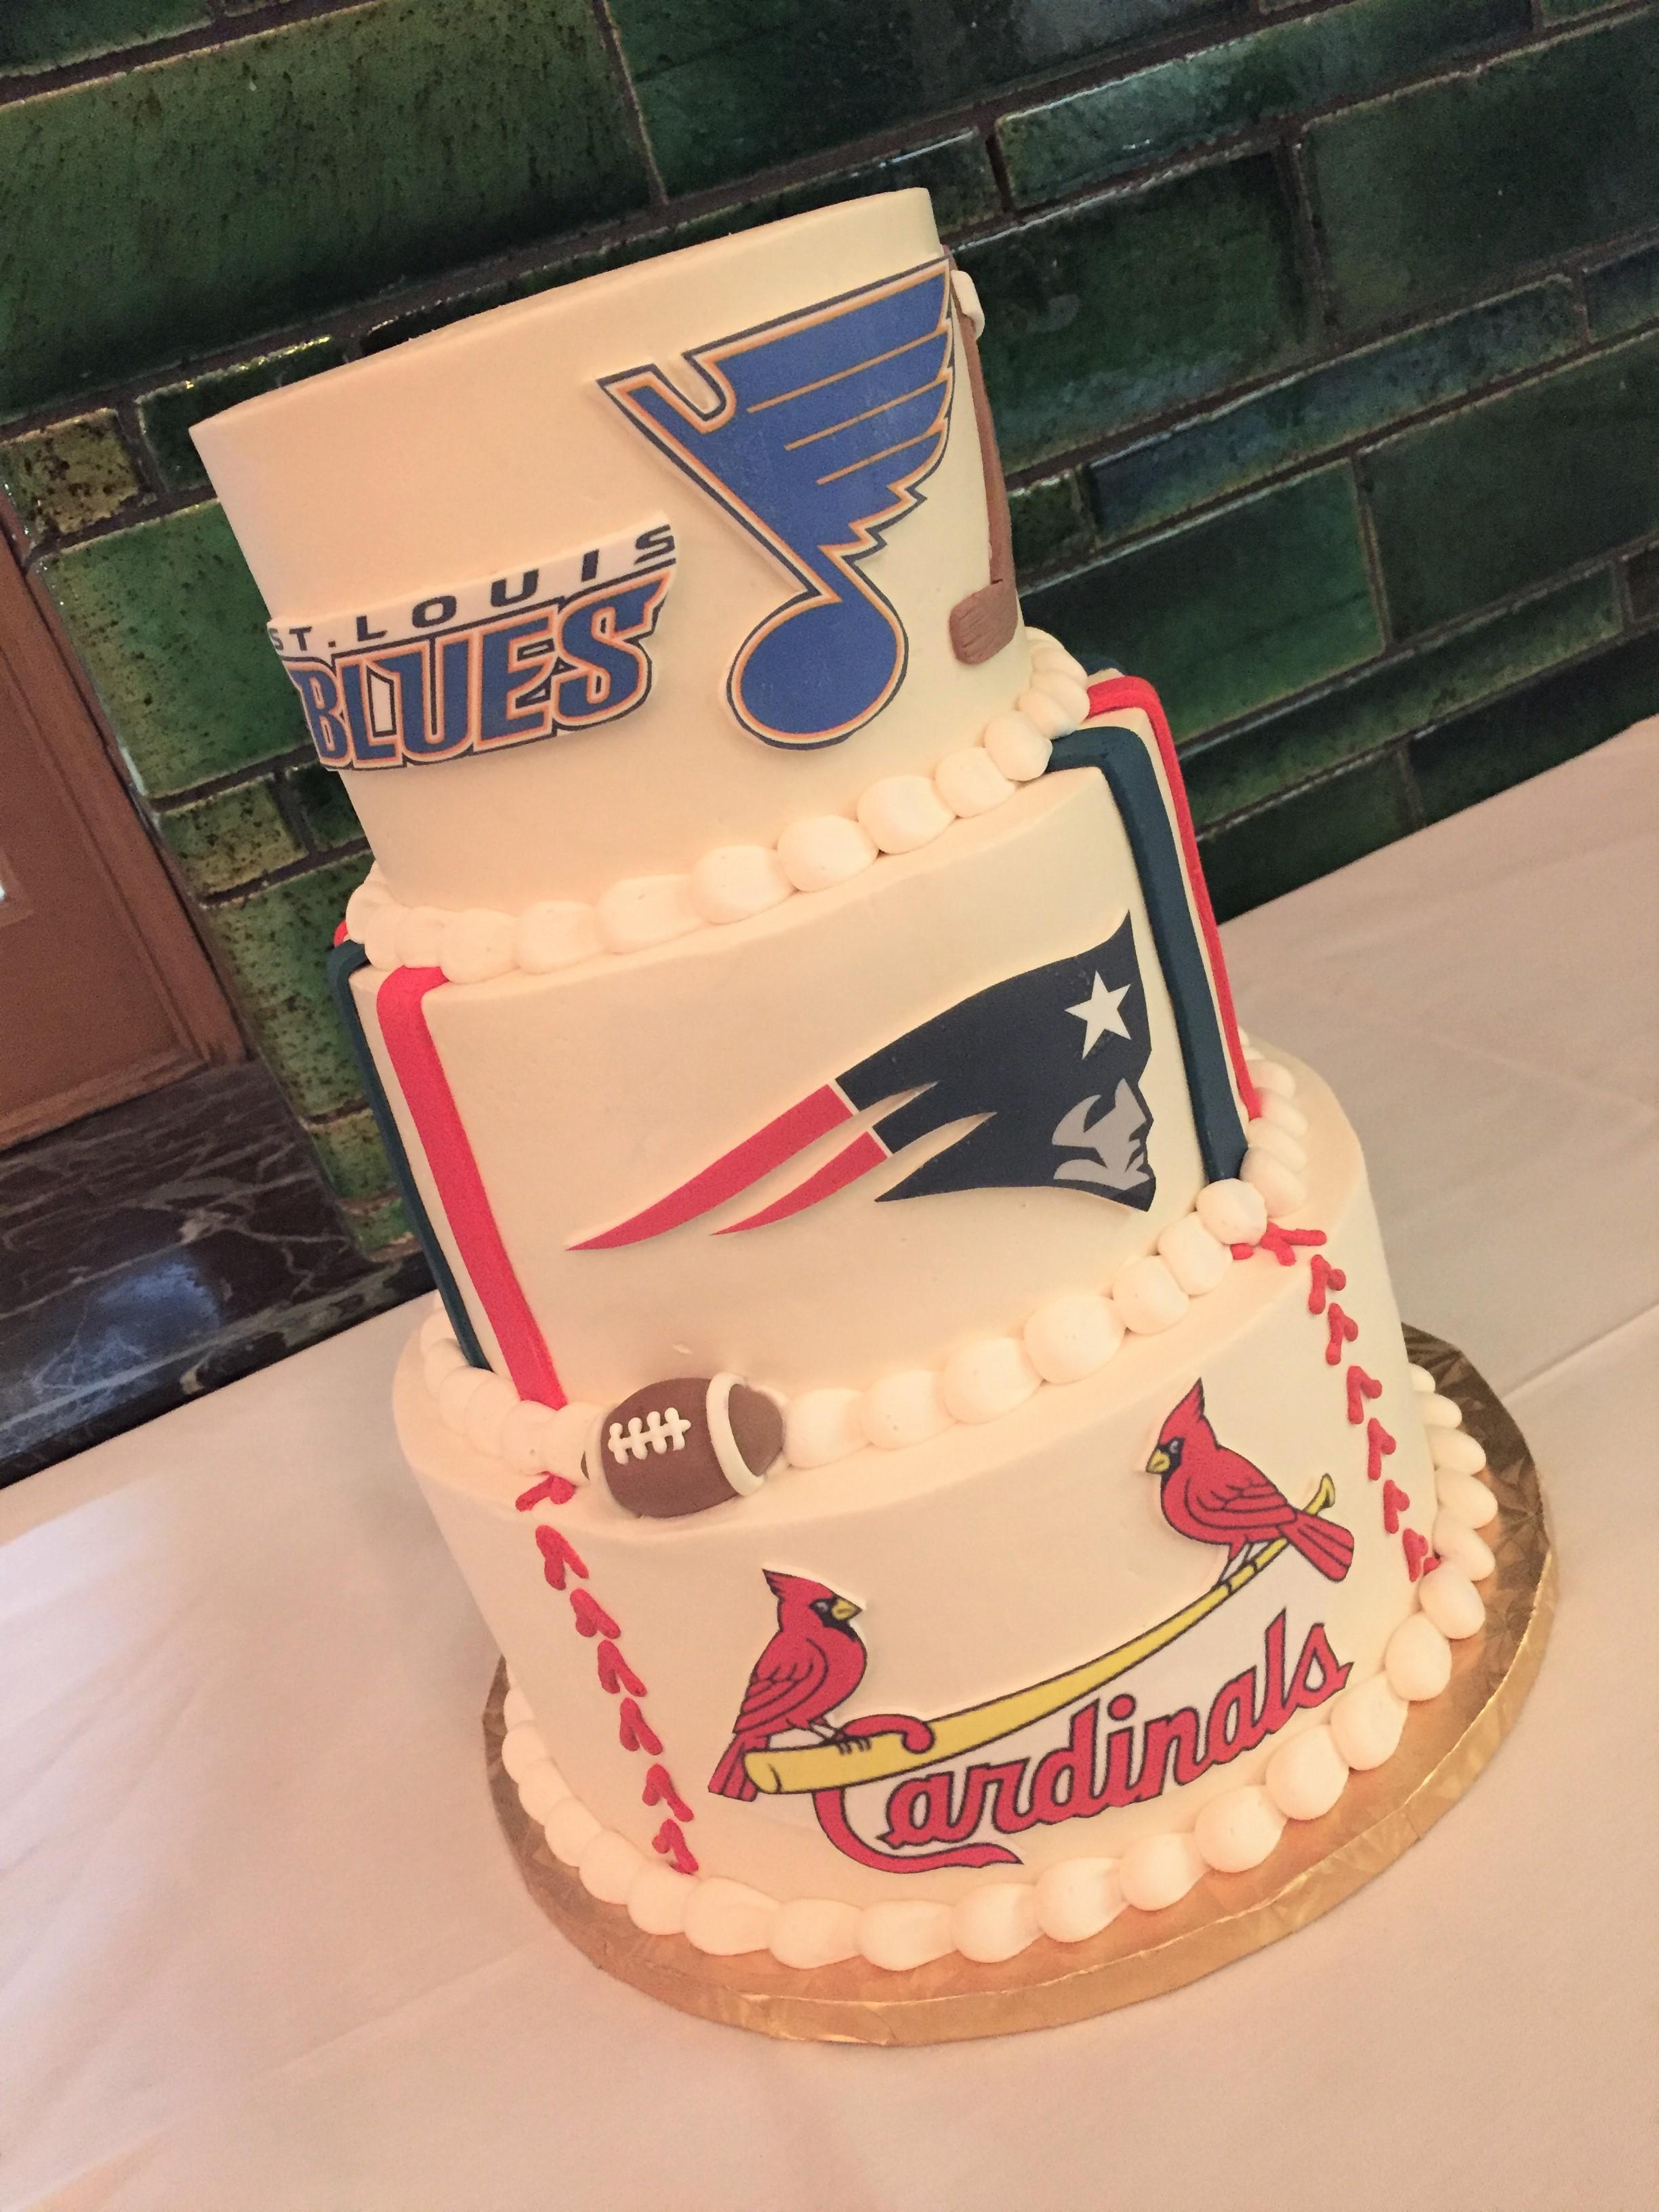 sports cake 3 tier.jpg